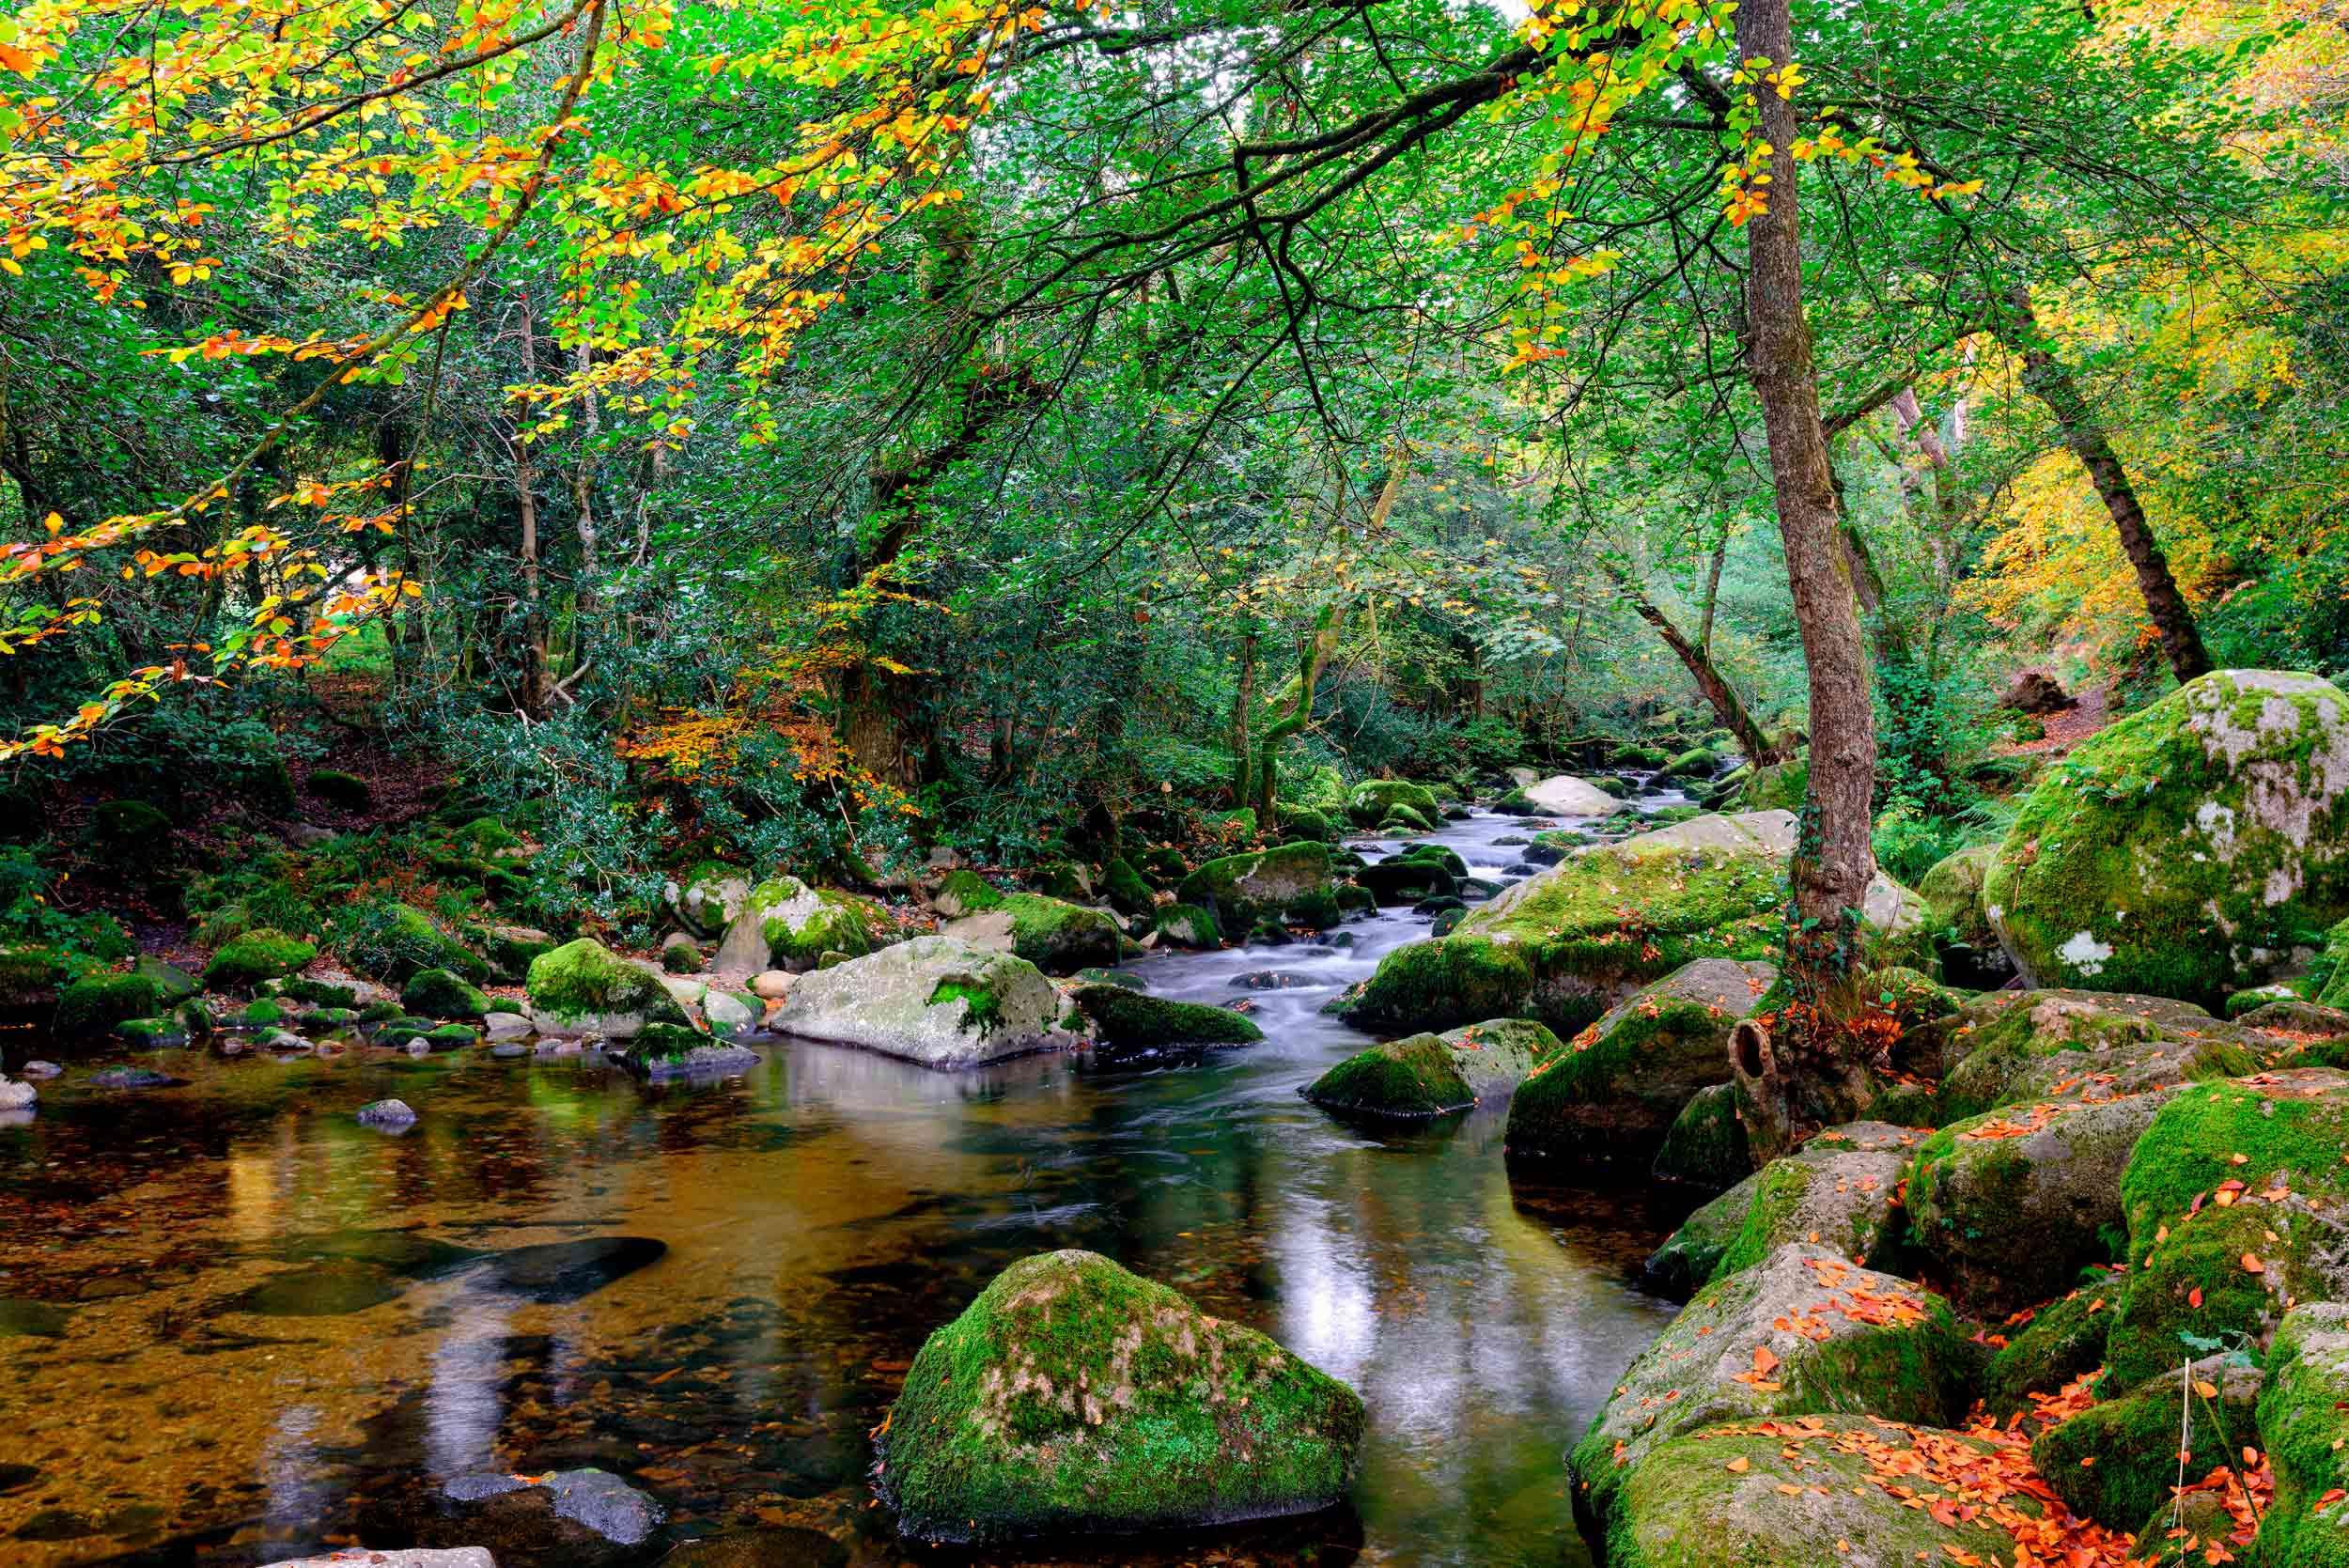 River Plym woodland  (Helen Hotson/Shutterstock)